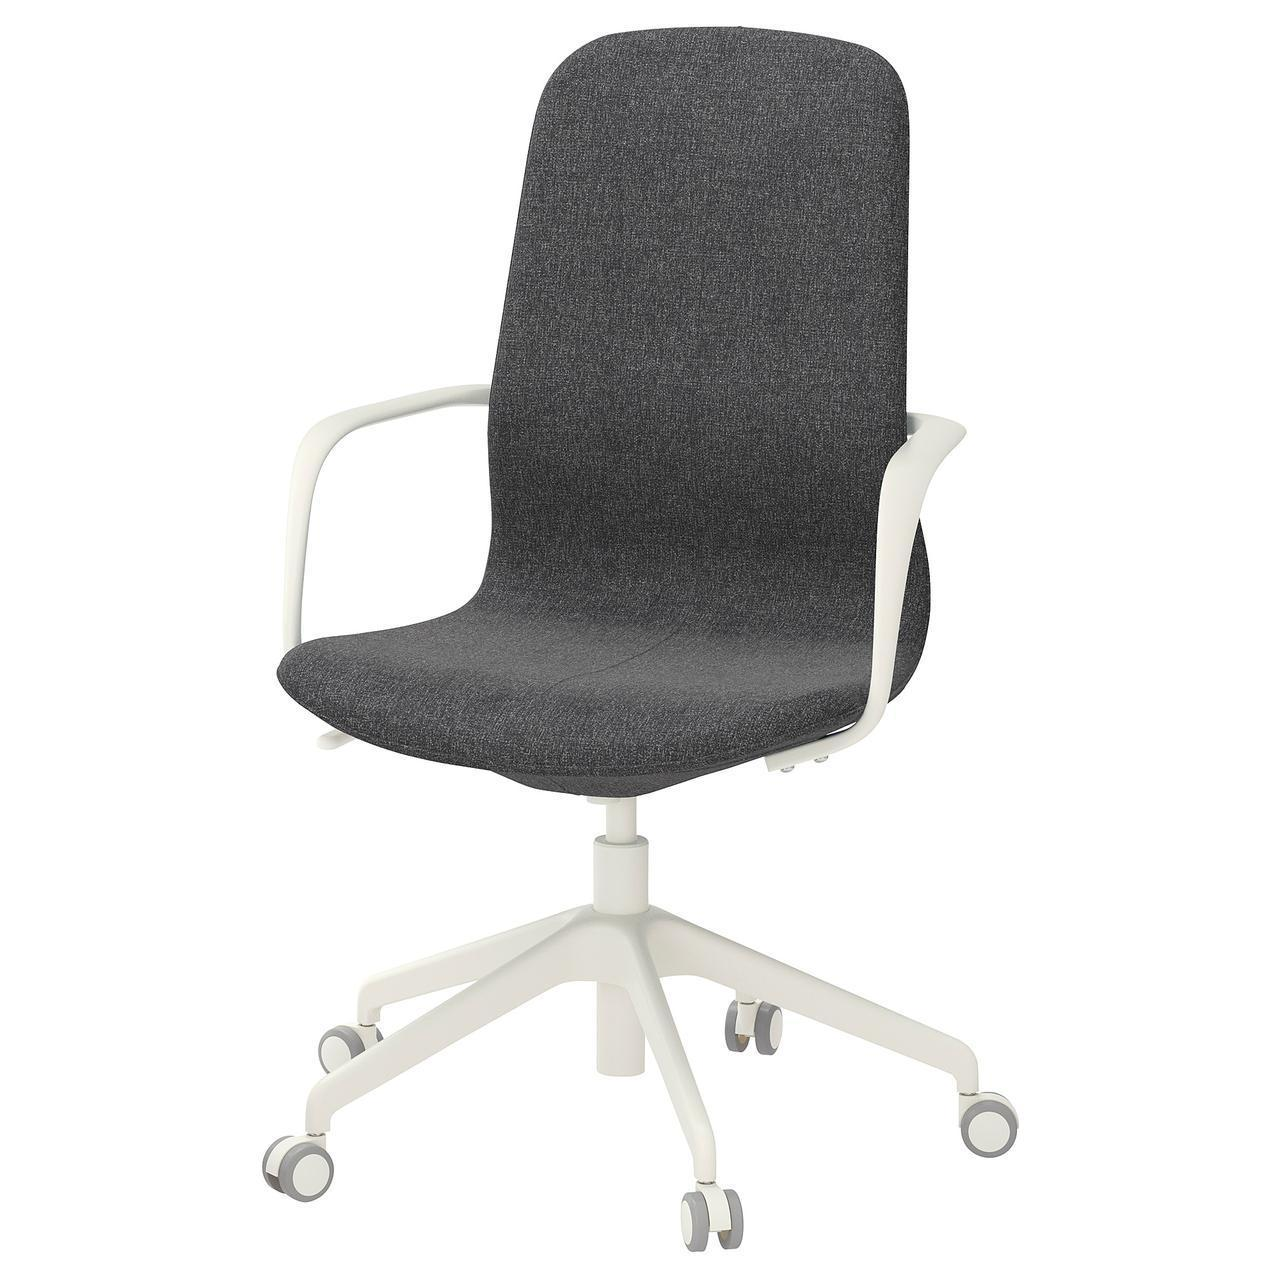 IKEA LANGFJALL Рабочий стул, темно-серый, белый  (292.528.65)